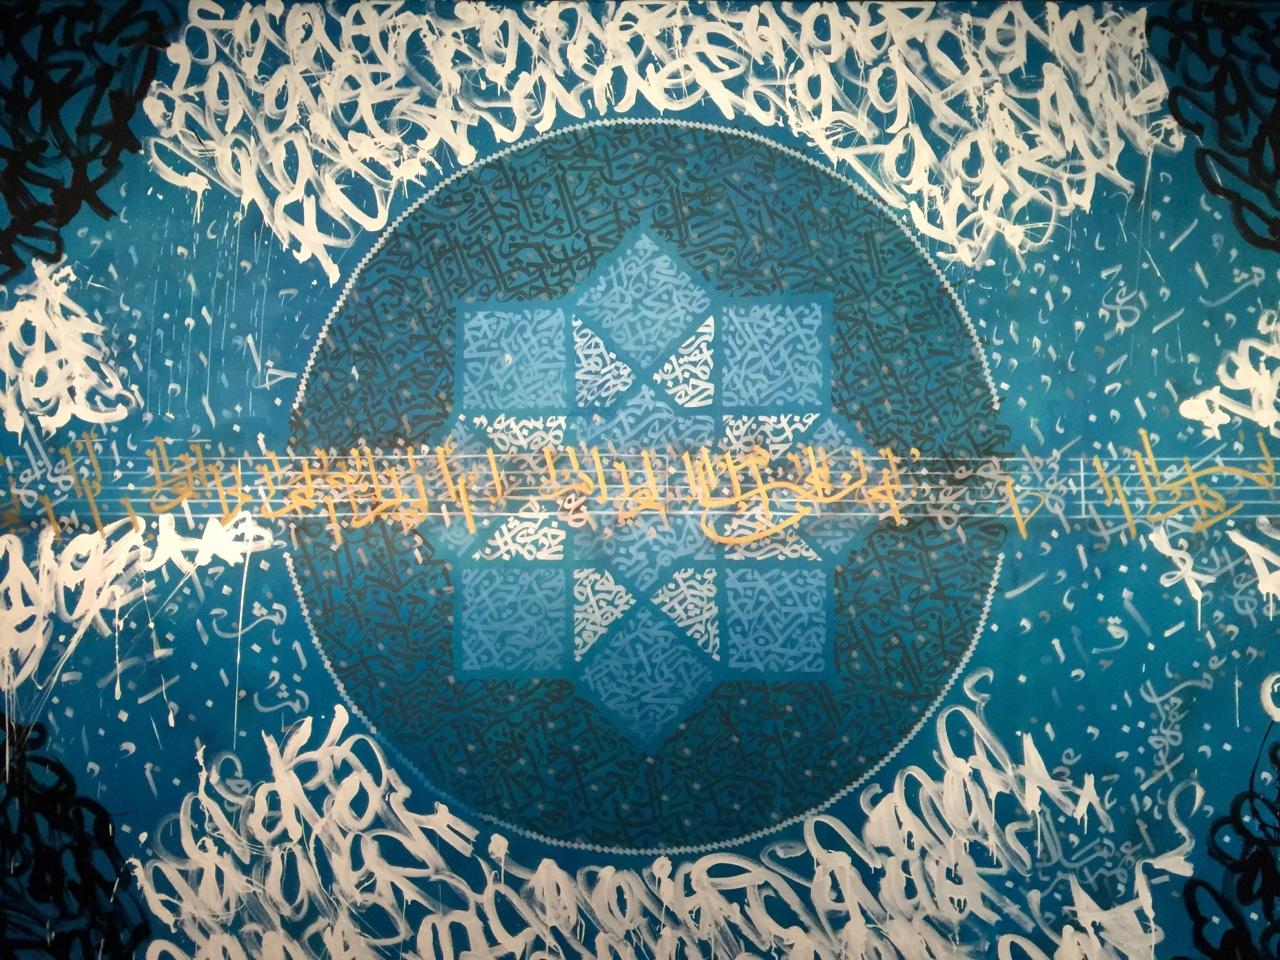 Jonone & Yazan Halwani  Sans Titre    Peintures acryliques et bombes aérosols   2015 Œuvre créée in situ    Jonone & Yazan Halwani  Untitled    Acrylic and Spray Cans   2015 Created on Site    [translation help from Google Translate]